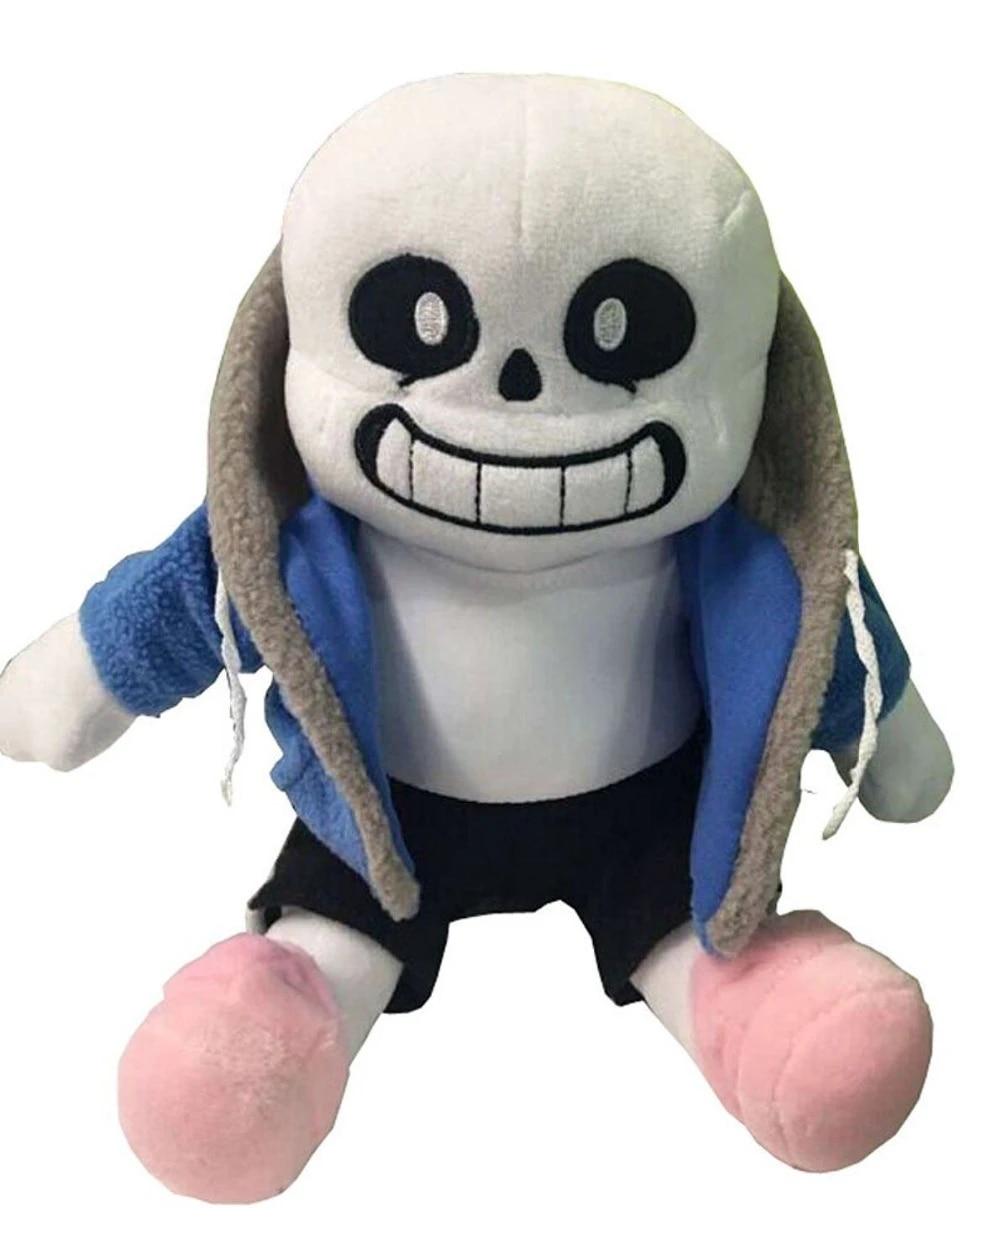 Undertale Sans Plush Stuffed Doll Toy Pillow Hugger Cushion Cosplay Toy KidsGift